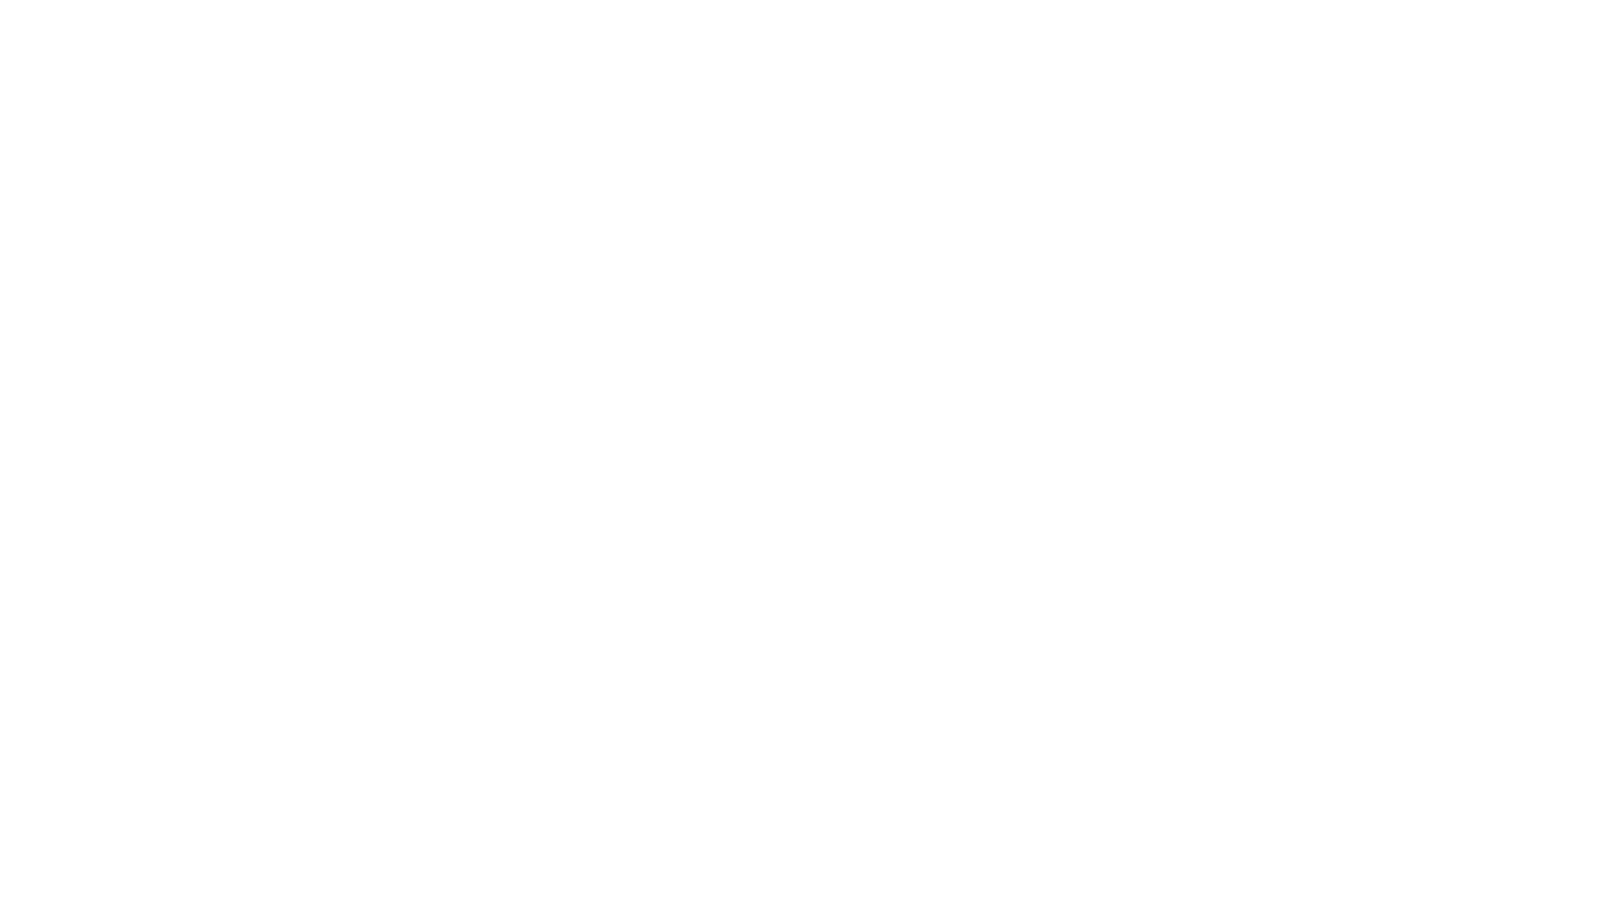 #OrkestarAleksandraSofronijevica #ToSunceSaKube #AleksandarSofronijevic #JasminaTrumbetas Label and copyright: AS STUDIOTON Sound Production Streaming link: https://fanlink.to/tosuncesakube Follow Aleksandar Sofronijević online:  Instagram ➣ https://bit.ly/3hiGnCO Facebook ➣ https://bit.ly/33AT0kh Follow AS STUDIOTON online: Instagram ➣ https://bit.ly/3uF35c3 Facebook ➣ https://bit.ly/33y8W6X ➣ Muzika: Dragiša Baša ➣ Tekst: Dragiša Baša ➣ Aranžman: A. Sofronijević,  M. Mihajlović ➣  Sopran: Jasmina Trumbetaš ➣Harmonika: A.Sofronijević ➣ Klavir: M. Mihajlović ➣ Violine: Nemanja Mijatović, Dragan Milivojević ➣ Duvački instrumenti: Mirko Matović ➣ Kontrabas: Nikola Labović ➣ Snimanje, mix, mastering: Ivan Lekić AS STUDIOTON, Viline vode bb, Beograd 🎧 Listen: Deezer: https://bit.ly/37ue1iL Spotify: https://spoti.fi/3yAAeYj Tidal: https://bit.ly/37Lo5UN Apple Music: https://apple.co/3s7JmRz Amazon Music: https://amzn.to/3iwY15I YouTube Music: https://bit.ly/3xyLYt6 🎵 Buy It On: iTunes: https://apple.co/3xLpzsJ Amazon: https://amzn.to/3CK0e66 Tekst:  To sunce sa Kube Što sija za sve nas Za sve časne ljude Slobode to je glas Da dignemo čelo Svi dostojanstveno Zlo budno nas čeka Da glavu pognemo Zabranjeno svako kopiranje video i/ili audio snimaka i postavljanje na druge kanale!